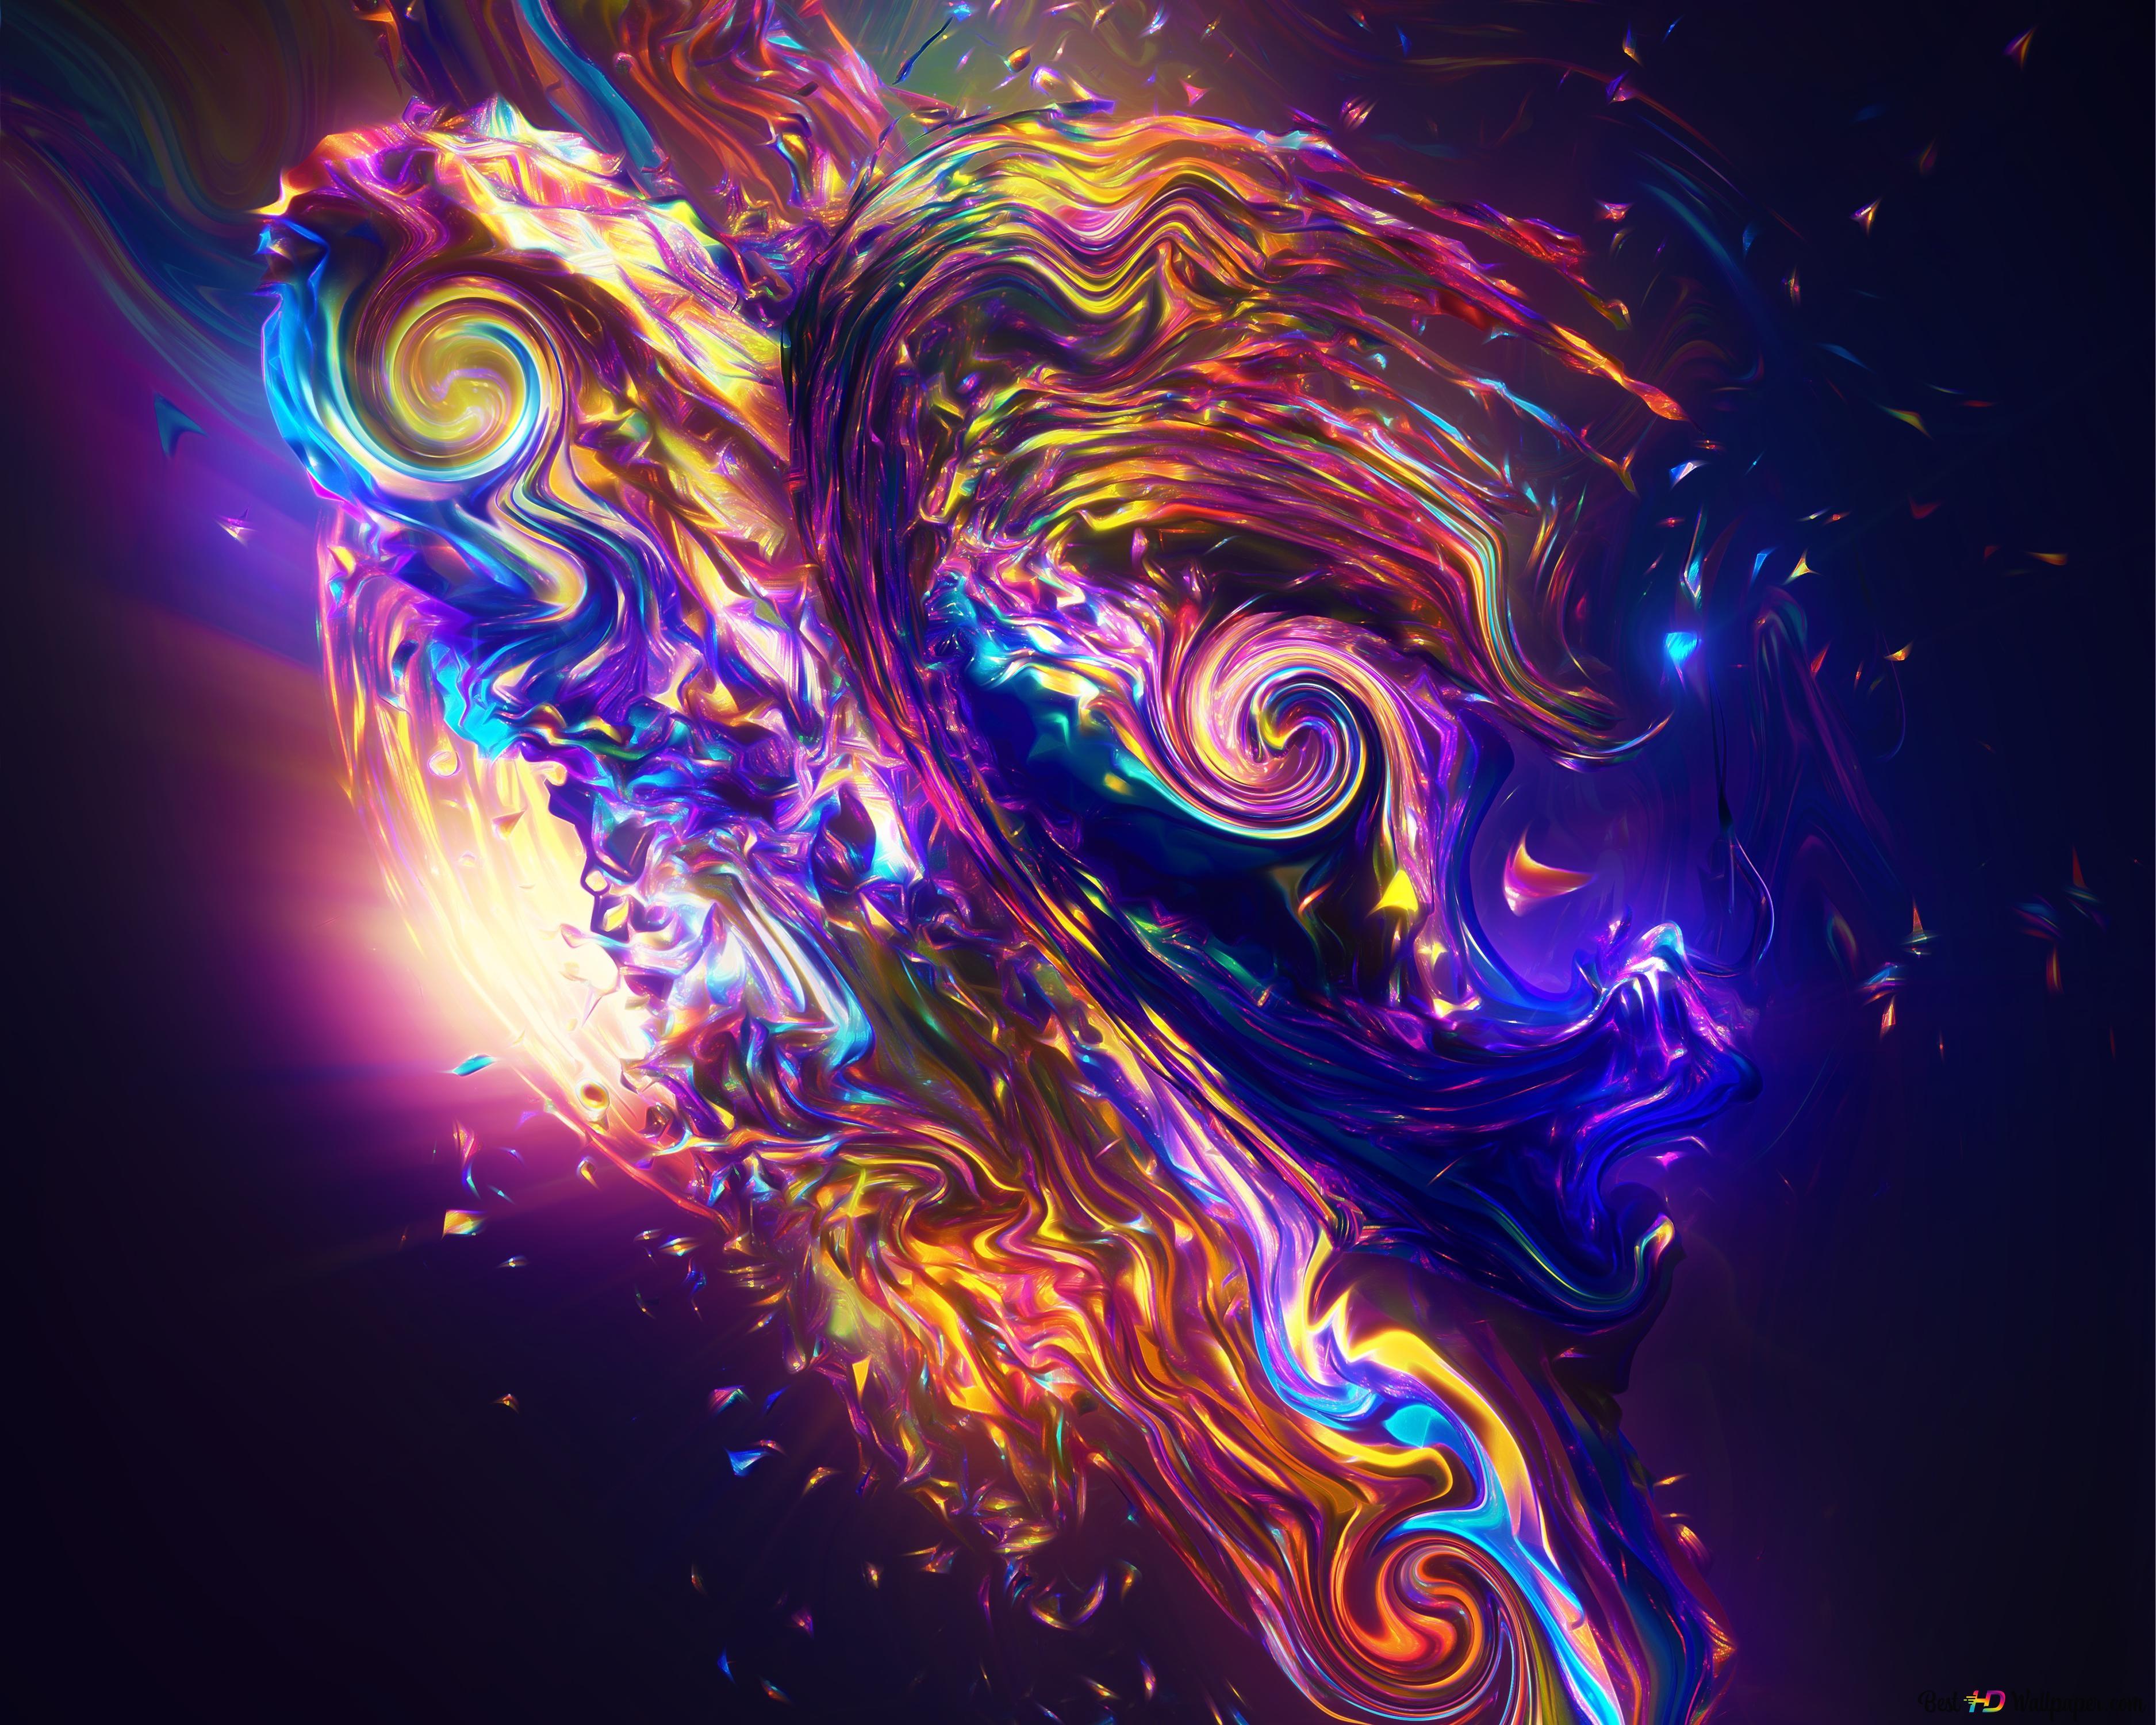 Vibrant Abstract Waves Hd Wallpaper Download